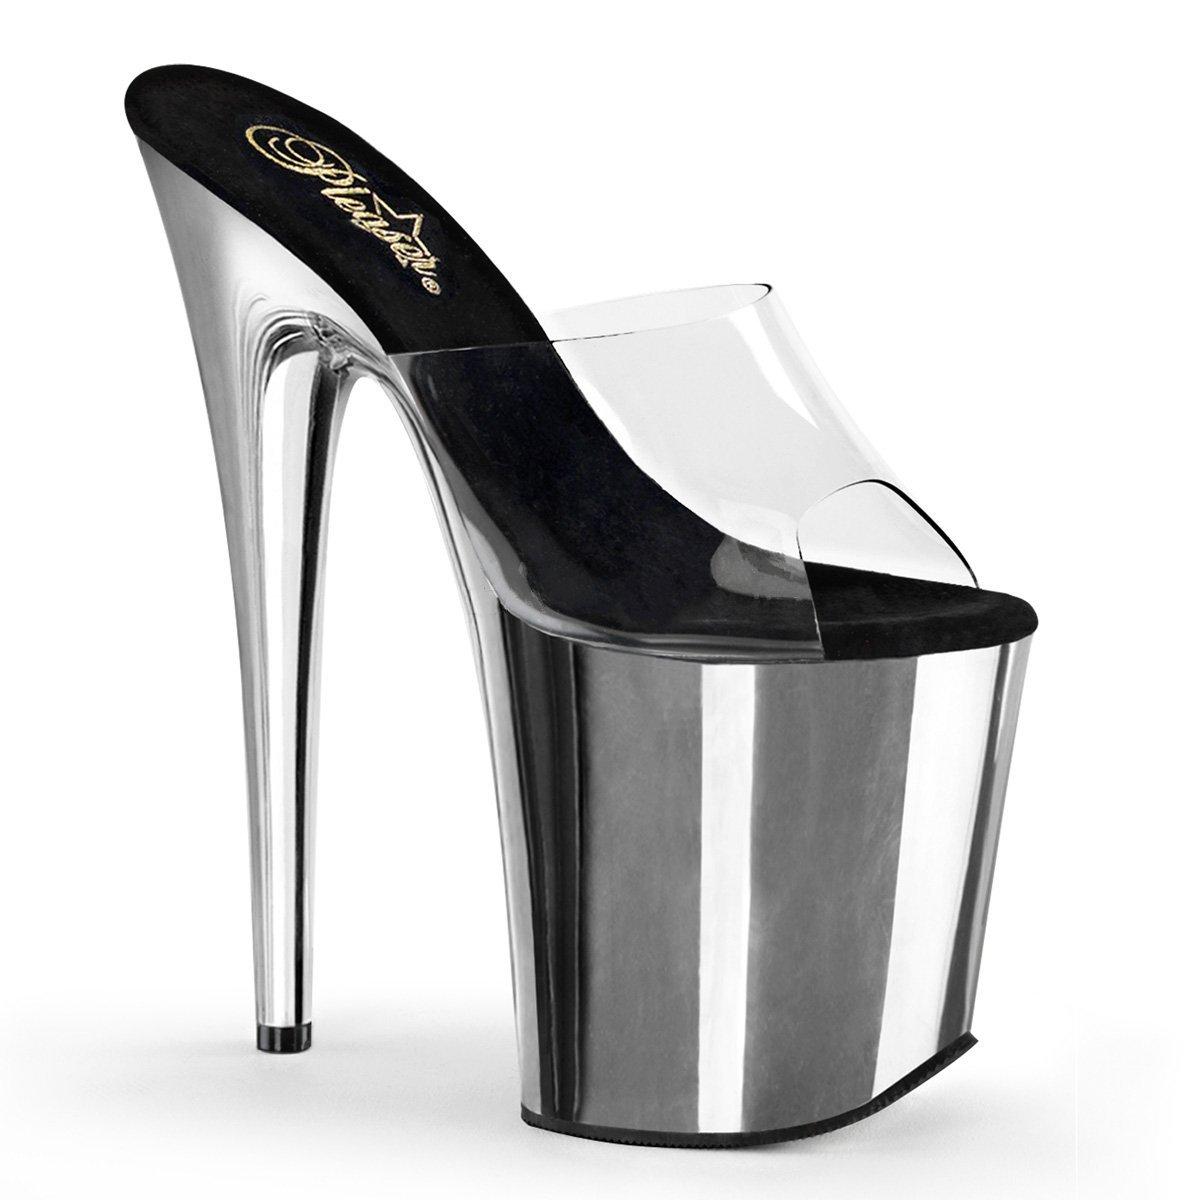 Pleaser Women's Flamingo 801 Fashion Slides Sandals B017LOFBBK 10 B(M) US Clr/Slv Chrome